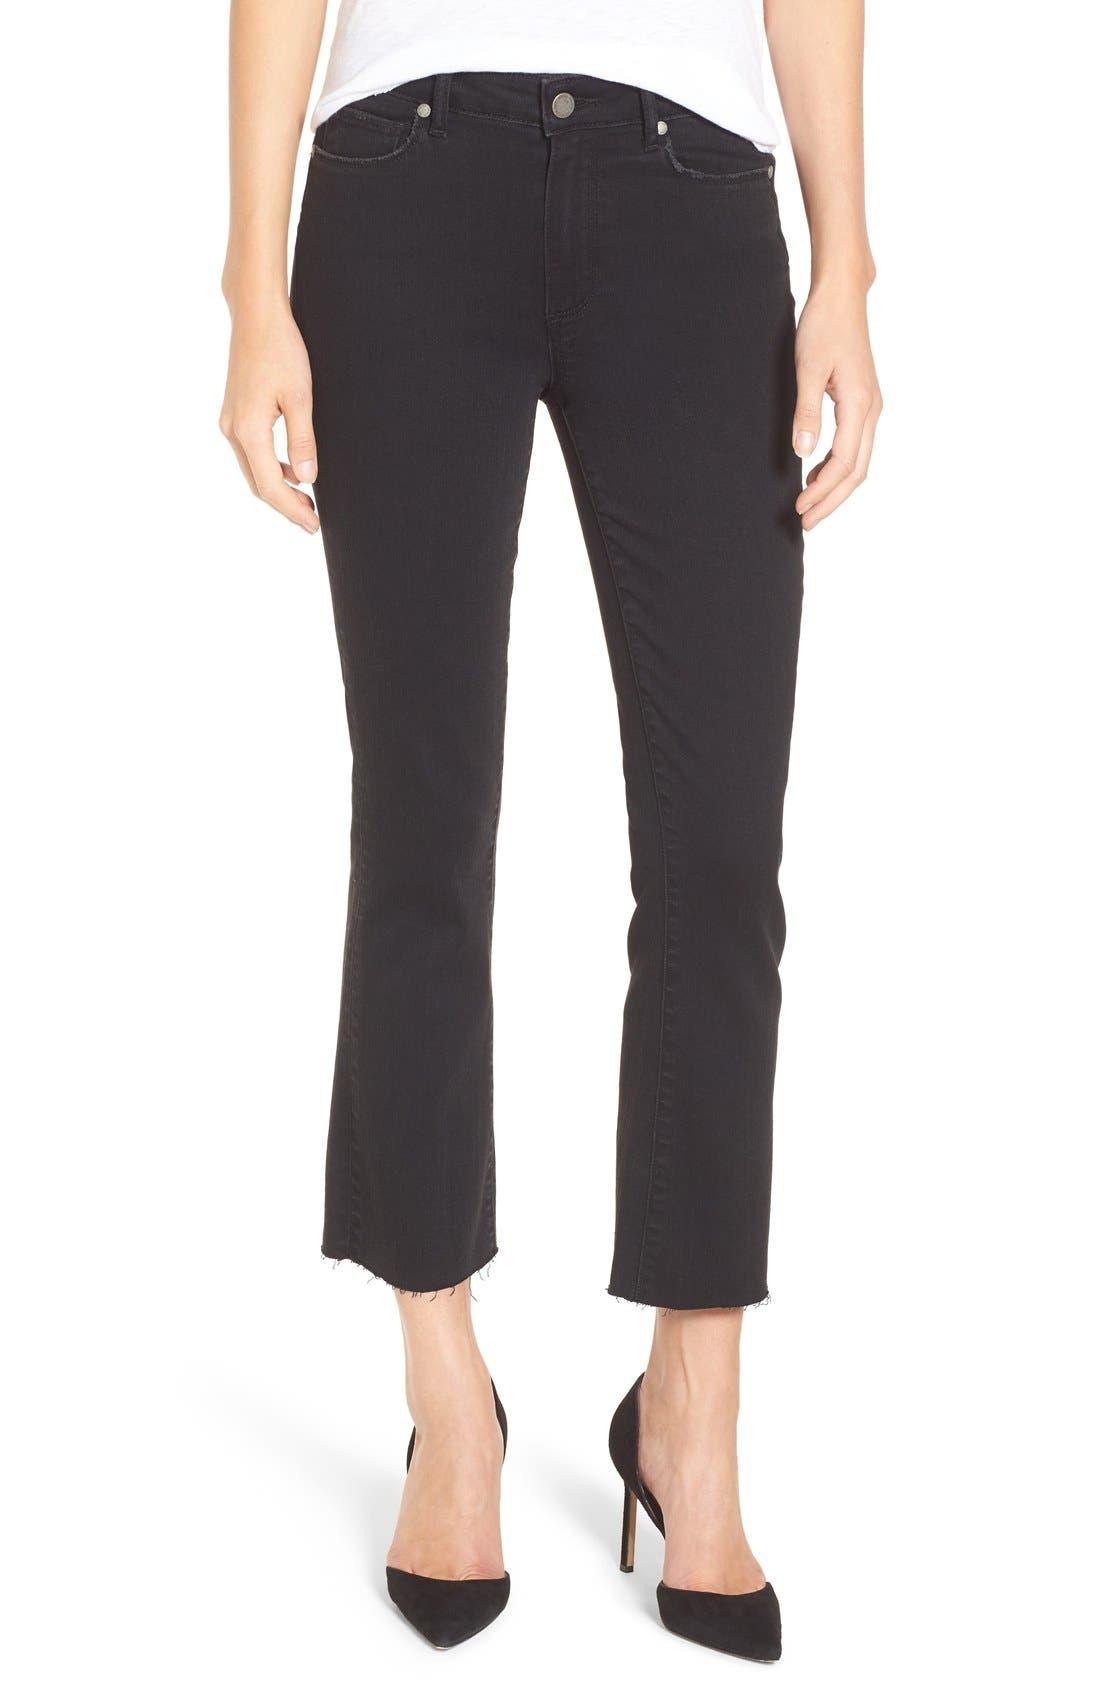 Colette High Waist Raw Hem Crop Flare Jeans,                             Main thumbnail 1, color,                             001